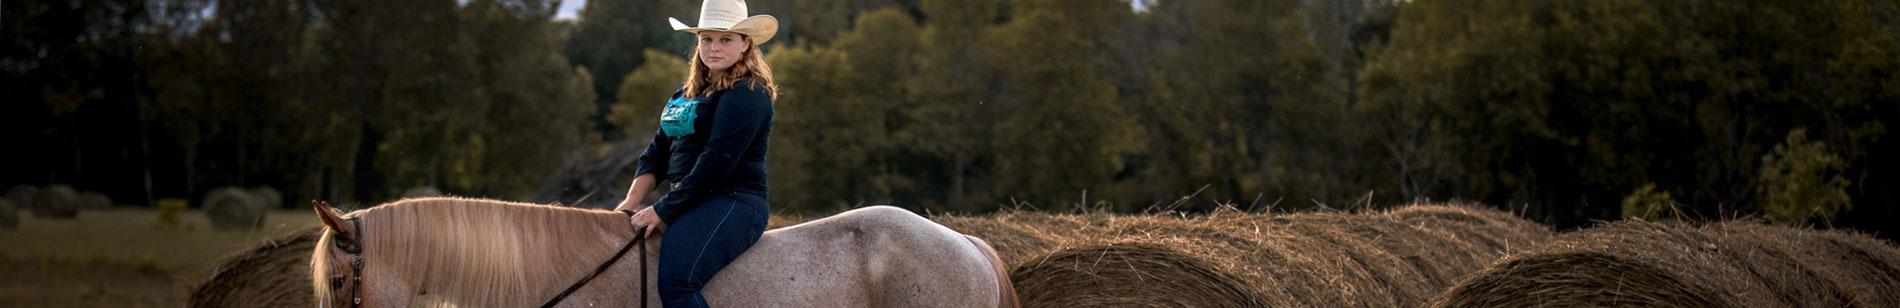 Facilities - RLH Equestrian